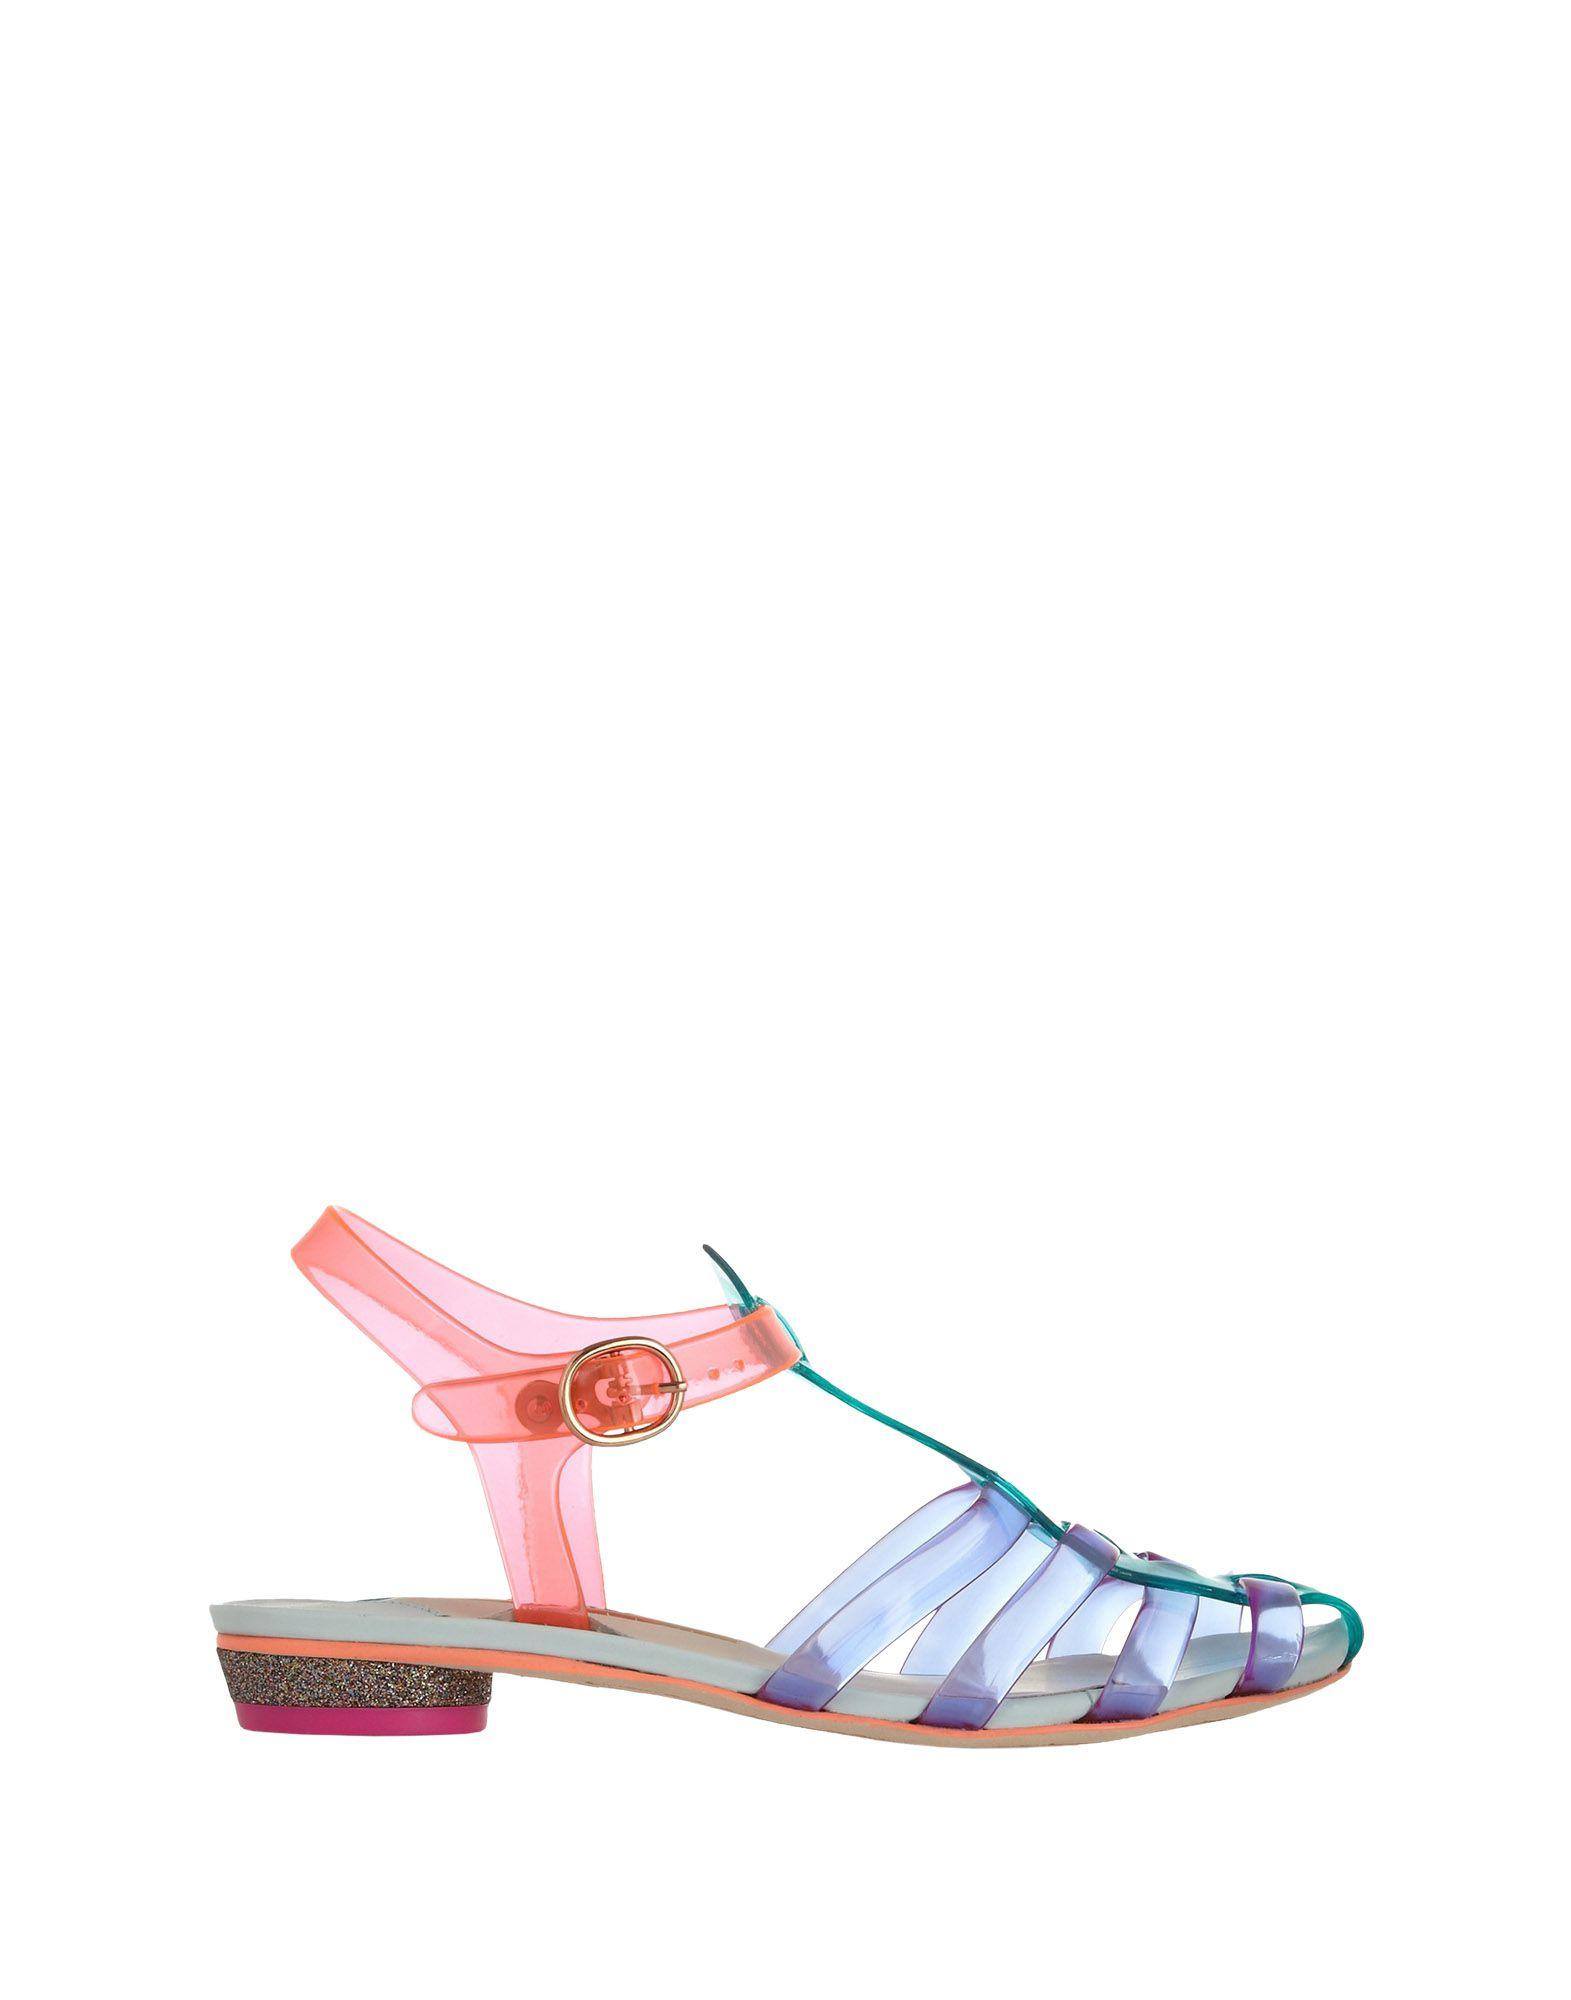 Sophia Webster Sandalen Gute Damen  11515250XB Gute Sandalen Qualität beliebte Schuhe f384f6